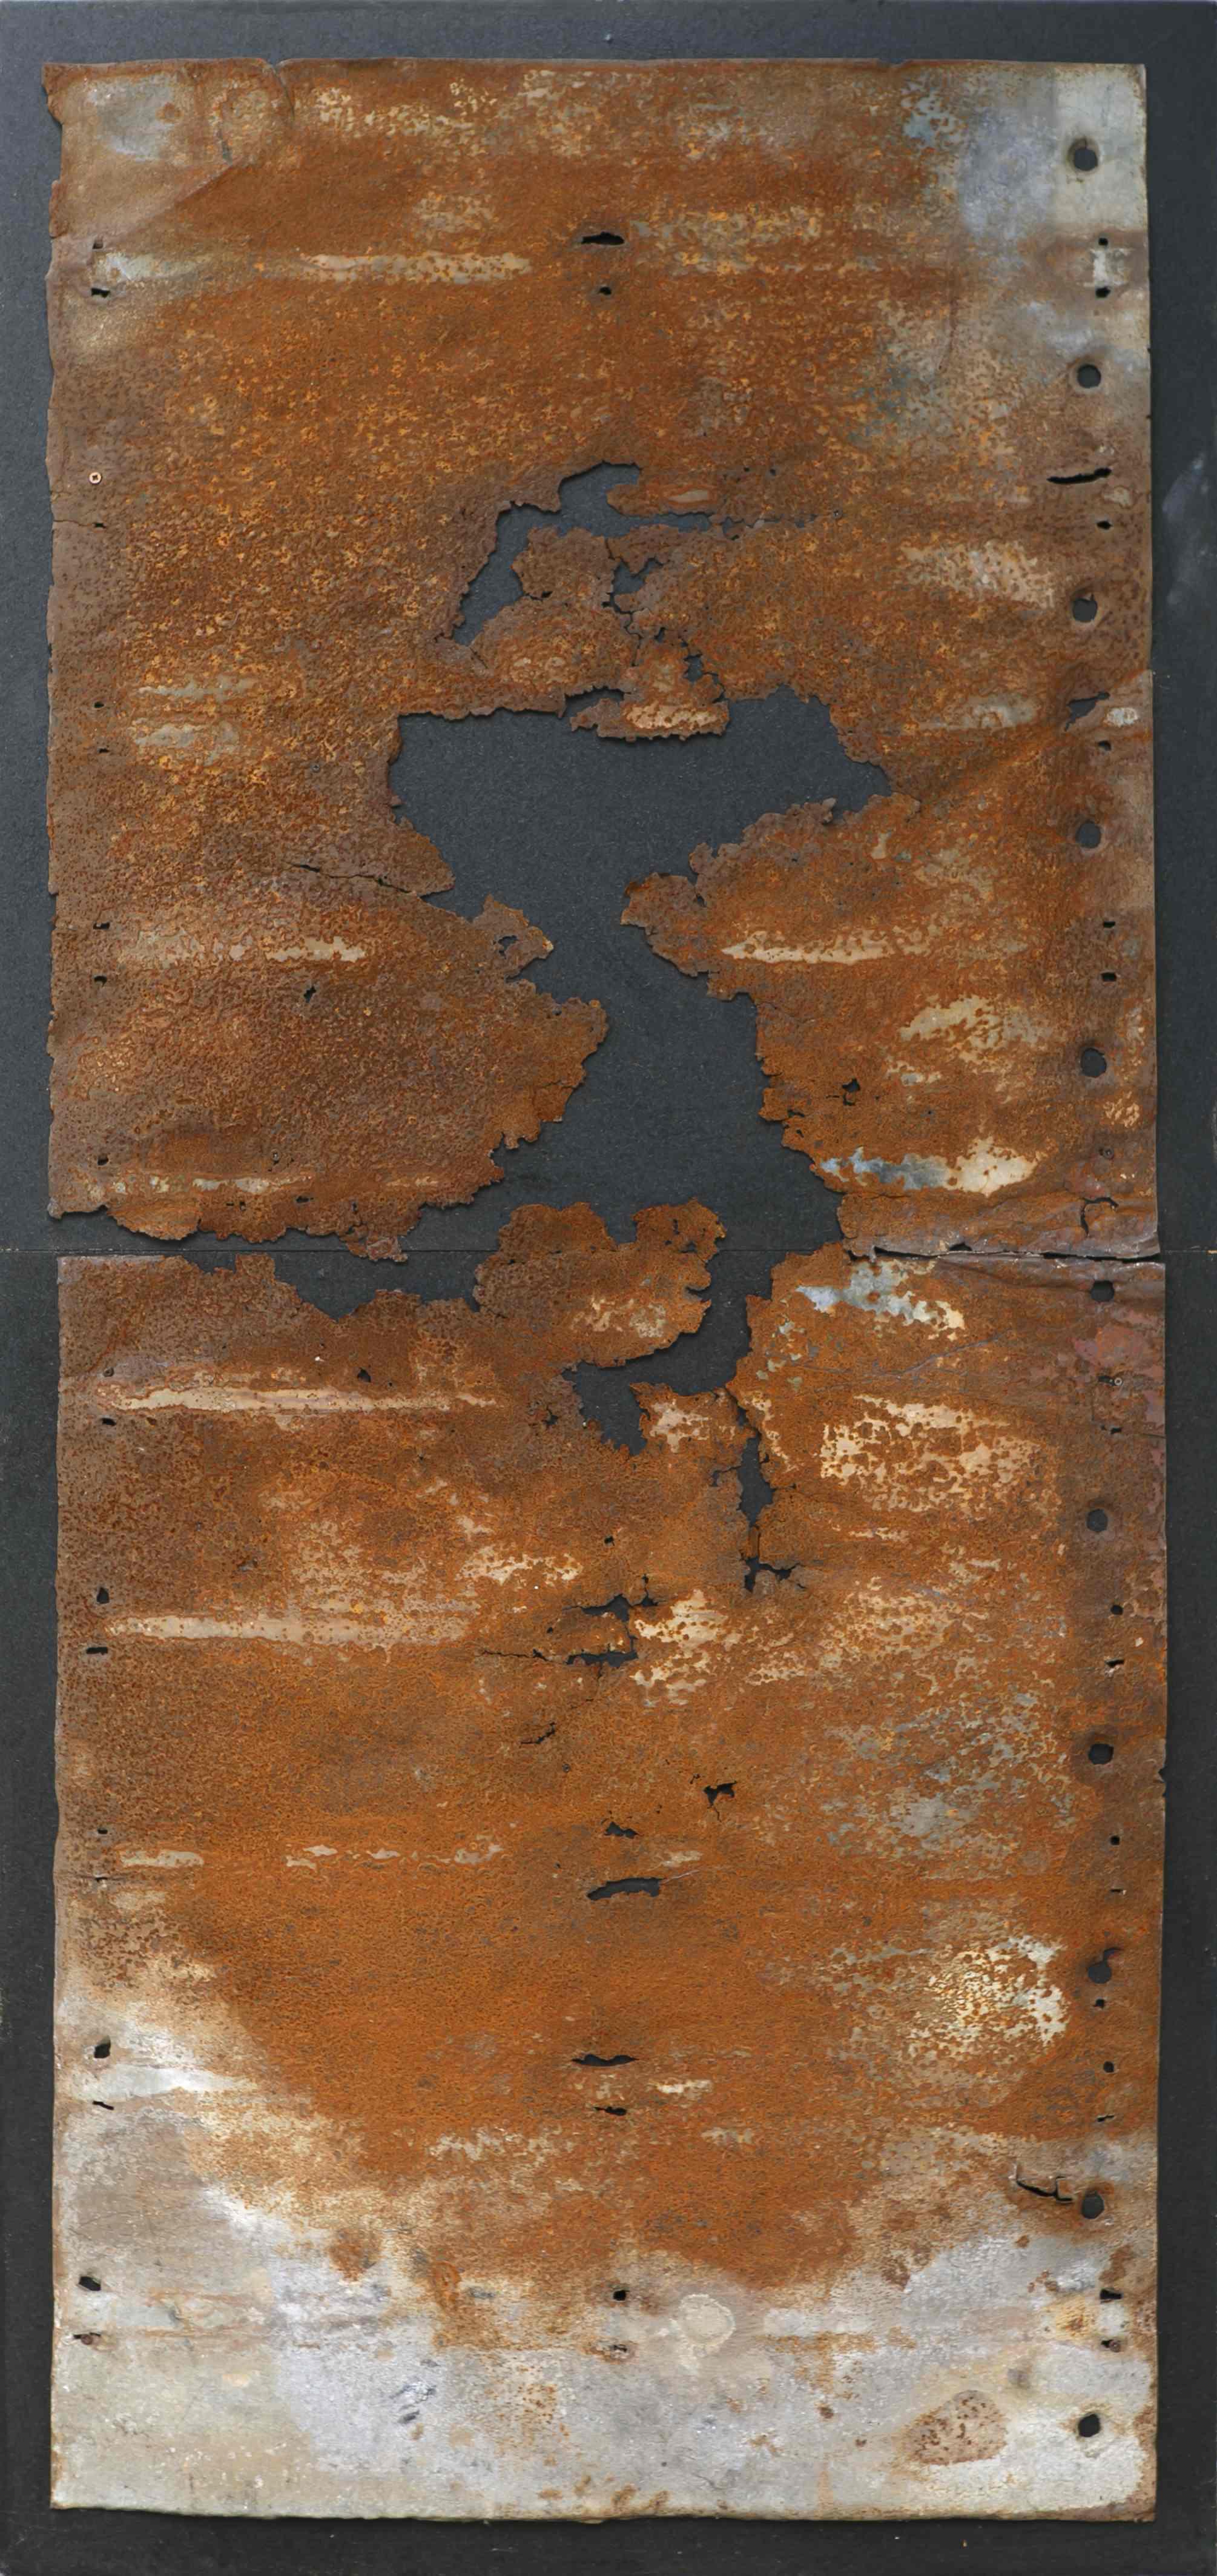 Fratture, ferro combusto su tavola, 164x80, 2000